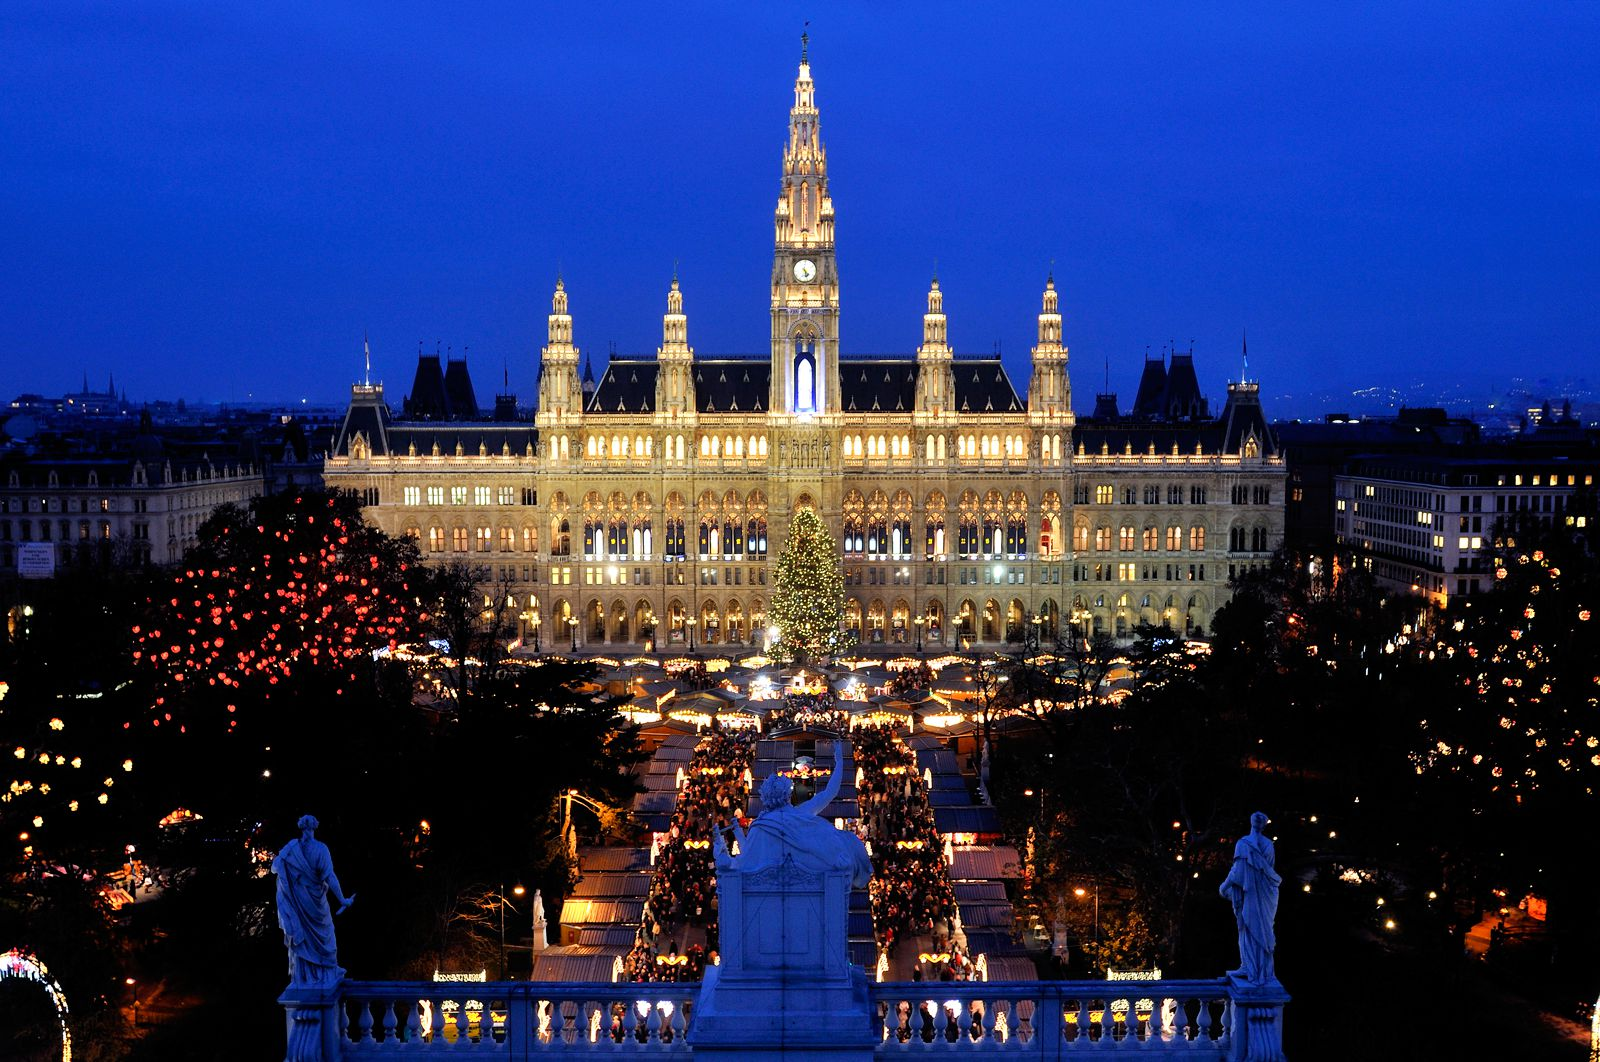 2021/01/Advent-Beč-5.jpg